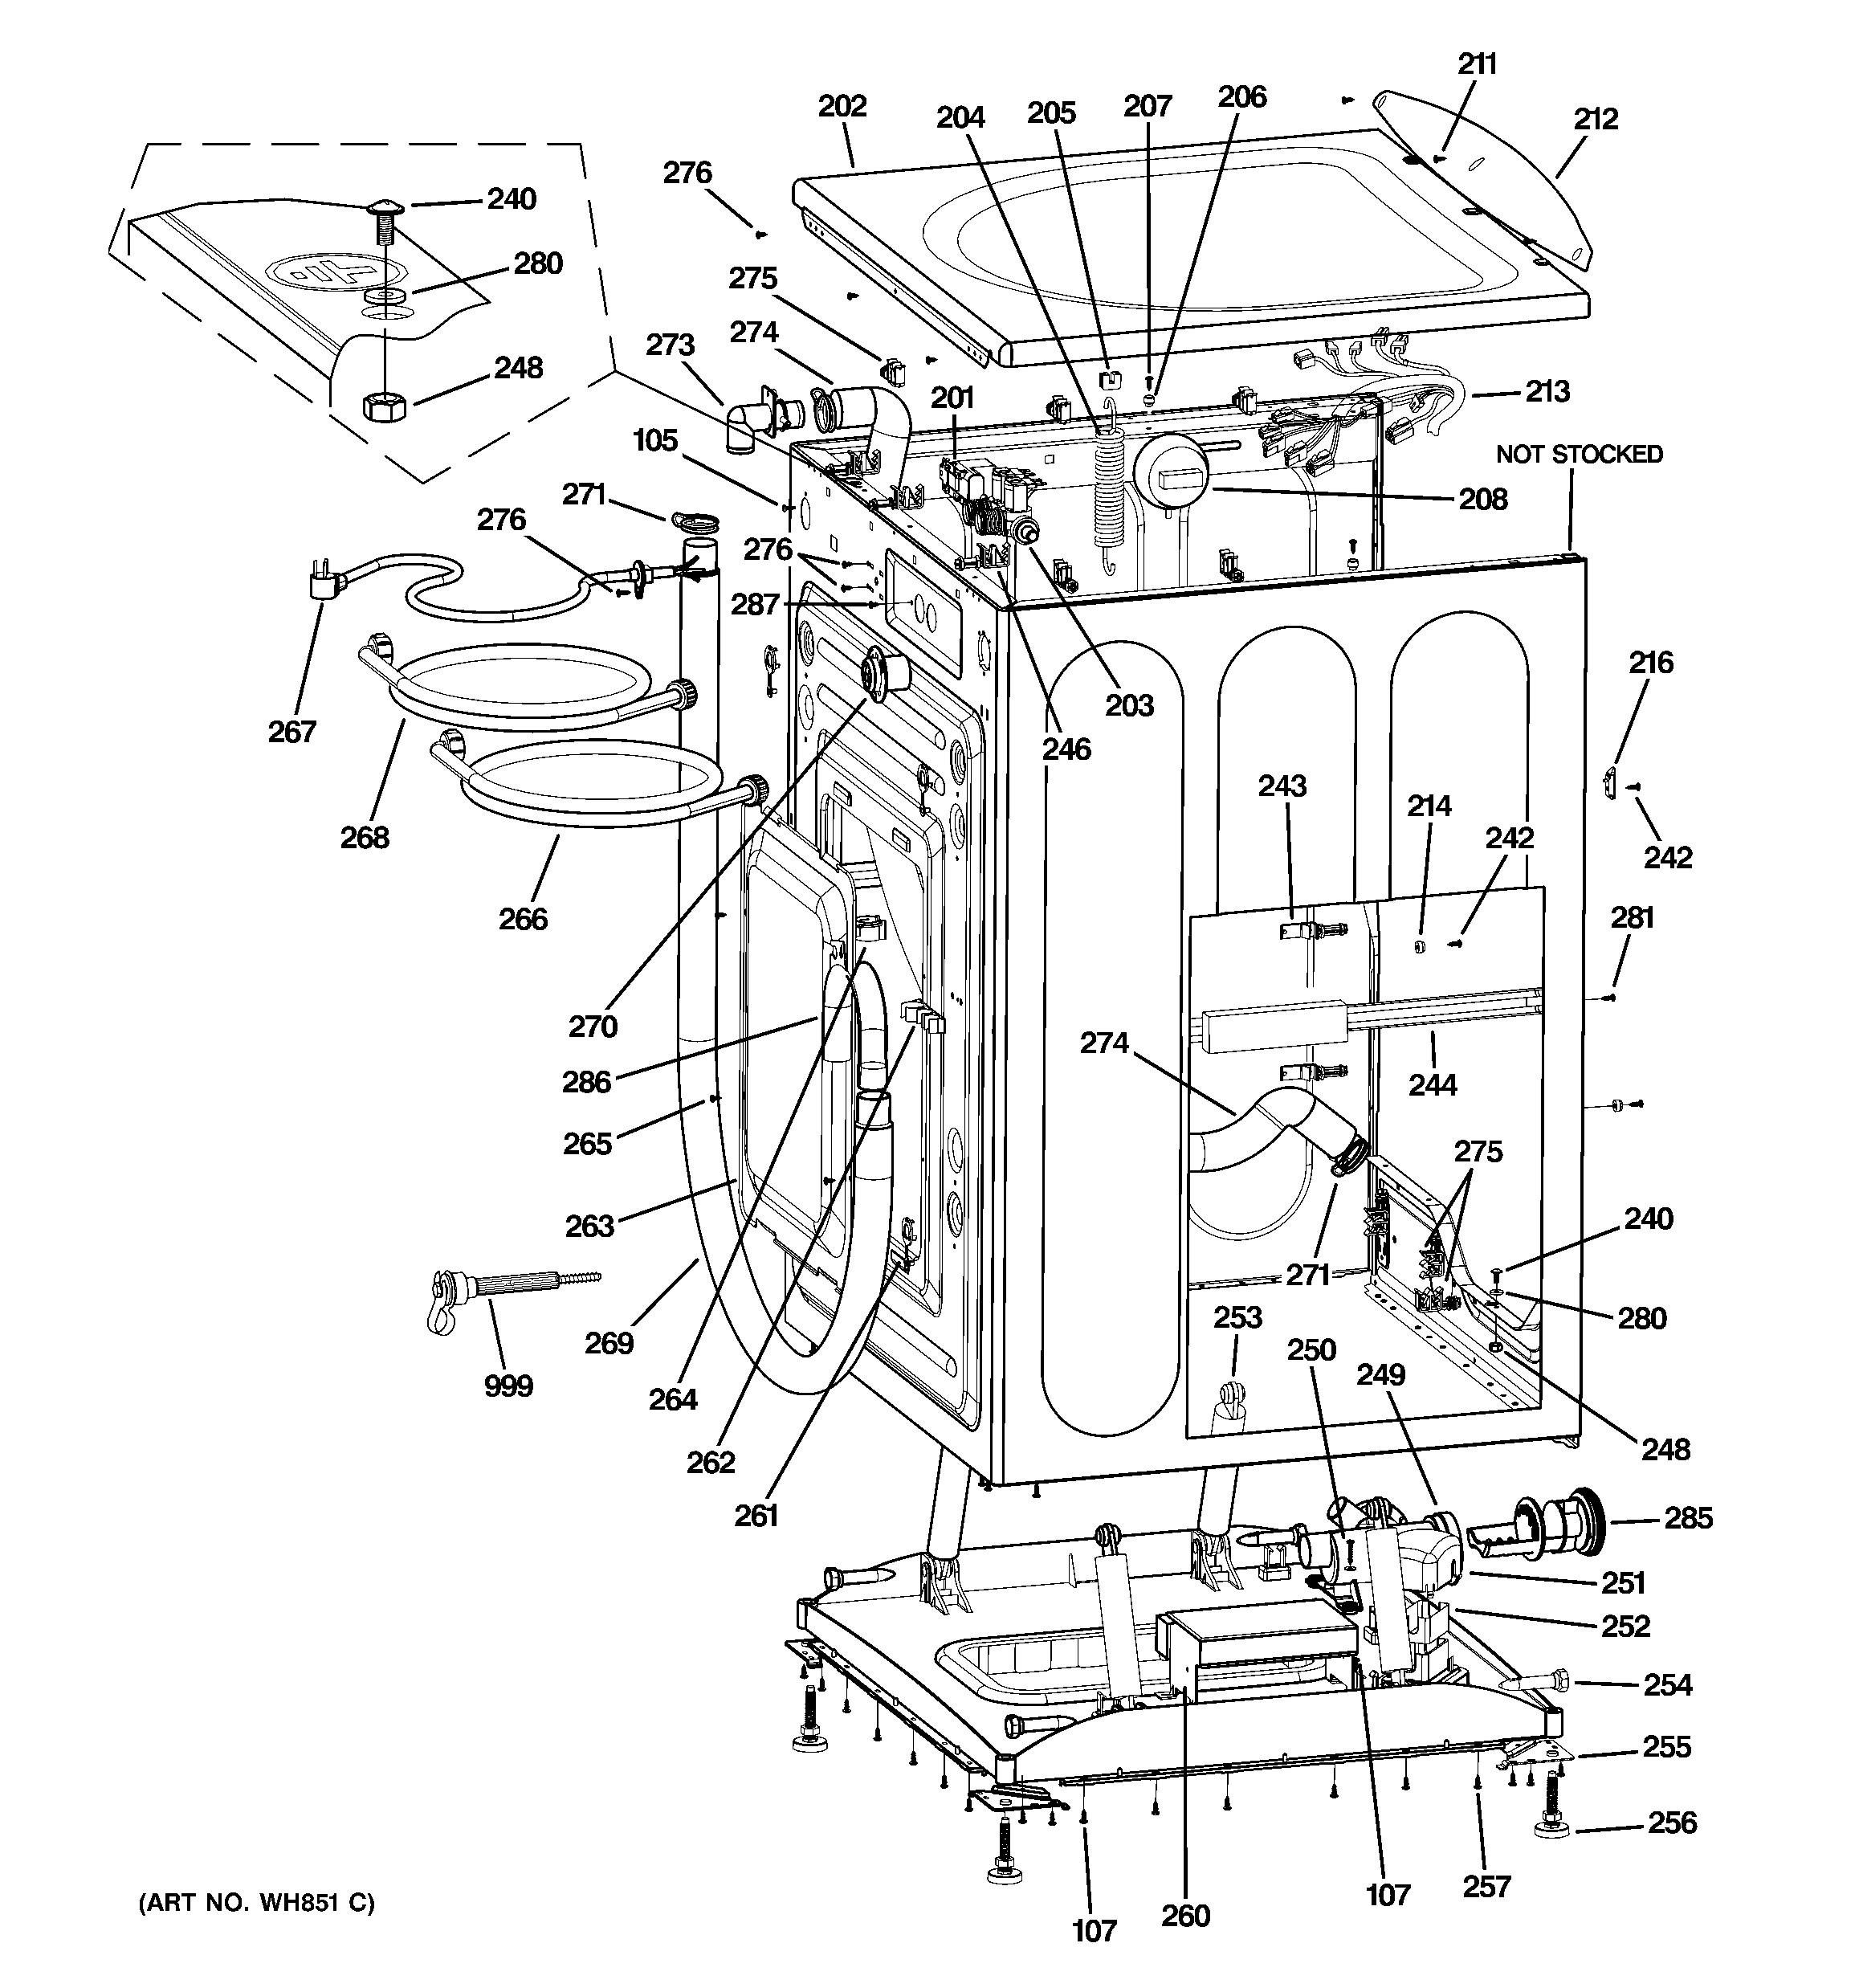 Ge Dishwasher Parts Diagram Ge Model Wbvh6240f0ww Residential Washers Genuine Parts Of Ge Dishwasher Parts Diagram